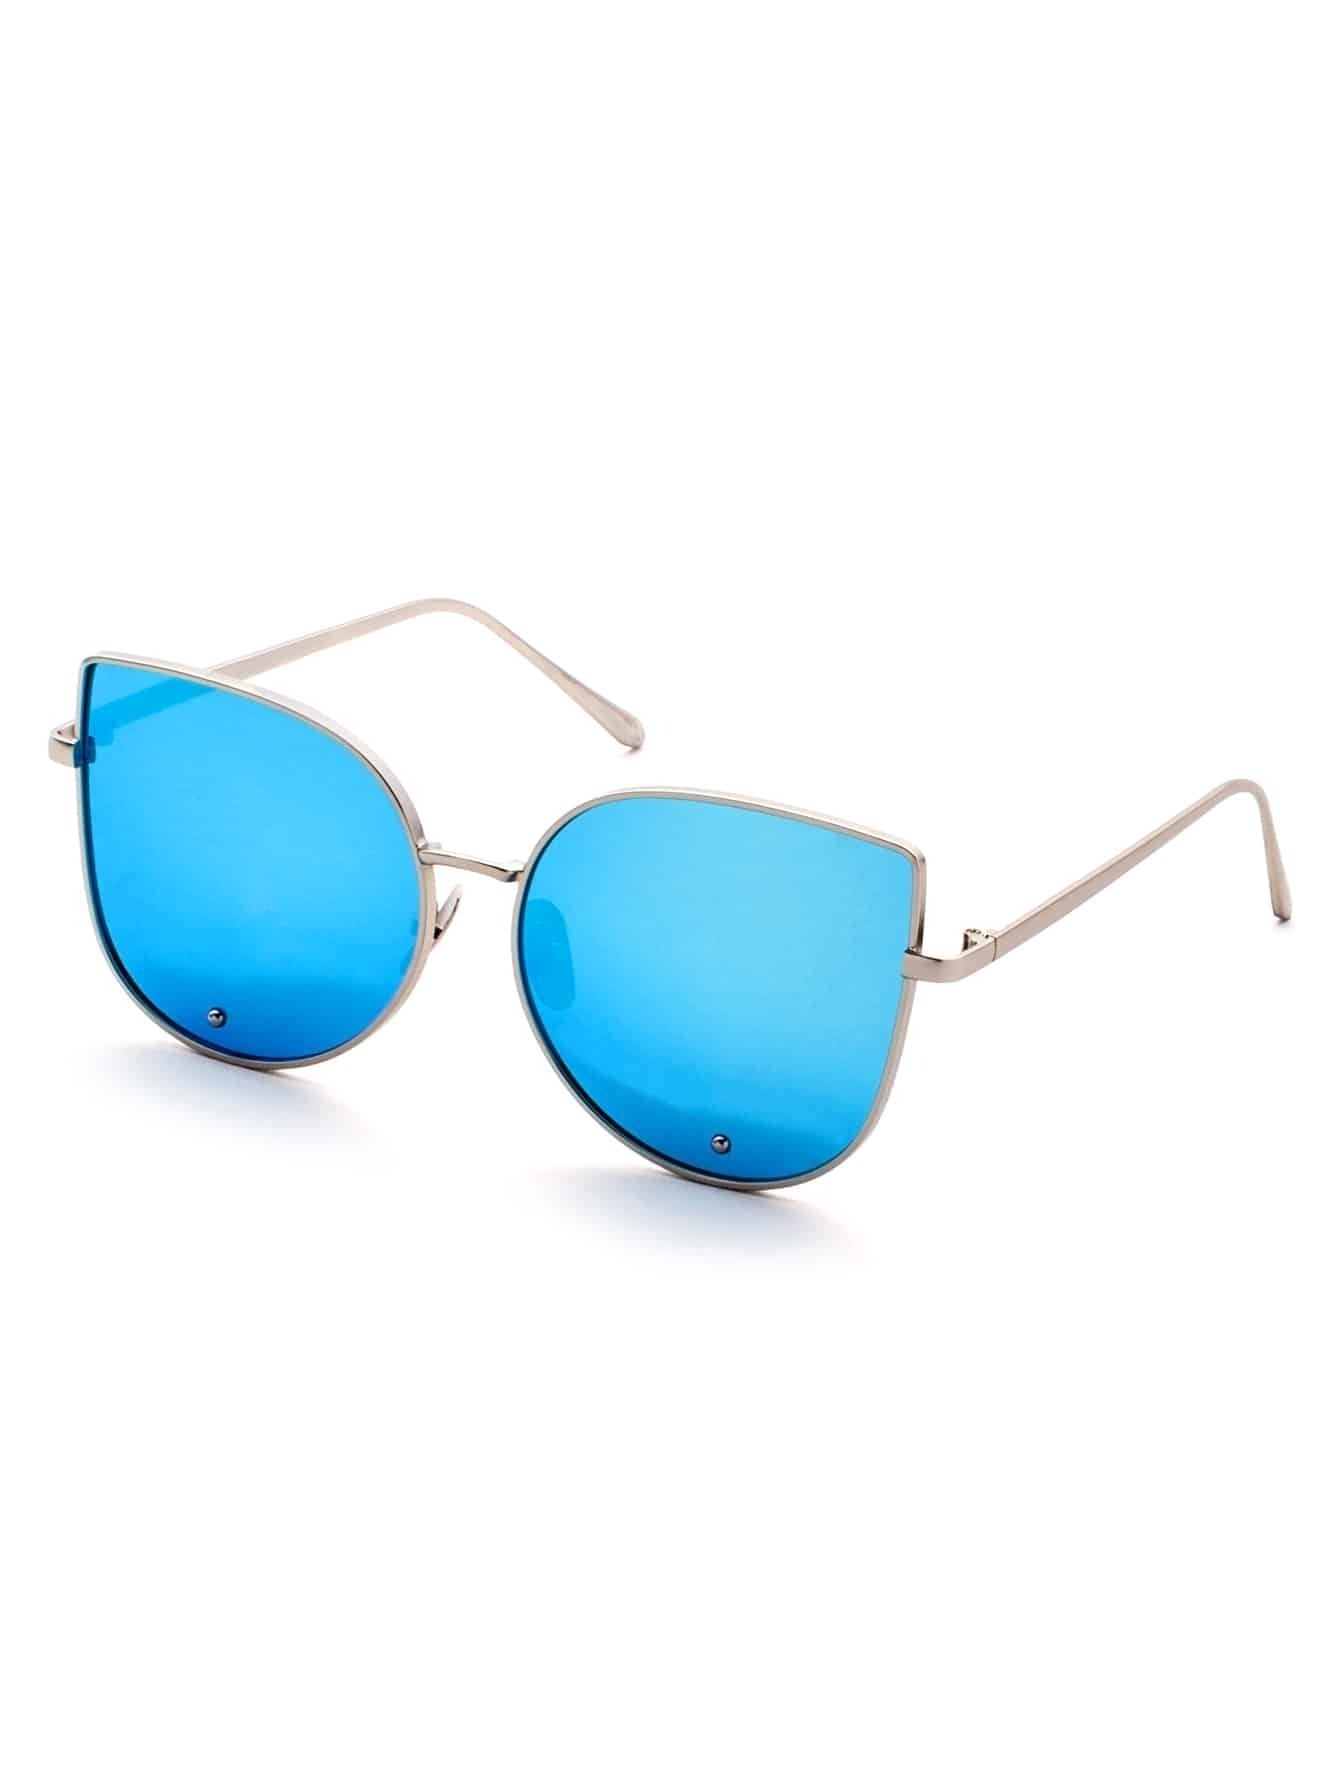 Gold Frame Cat Eye Sunglasses : Gold Frame Blue Cat Eye Stylish Sunglasses